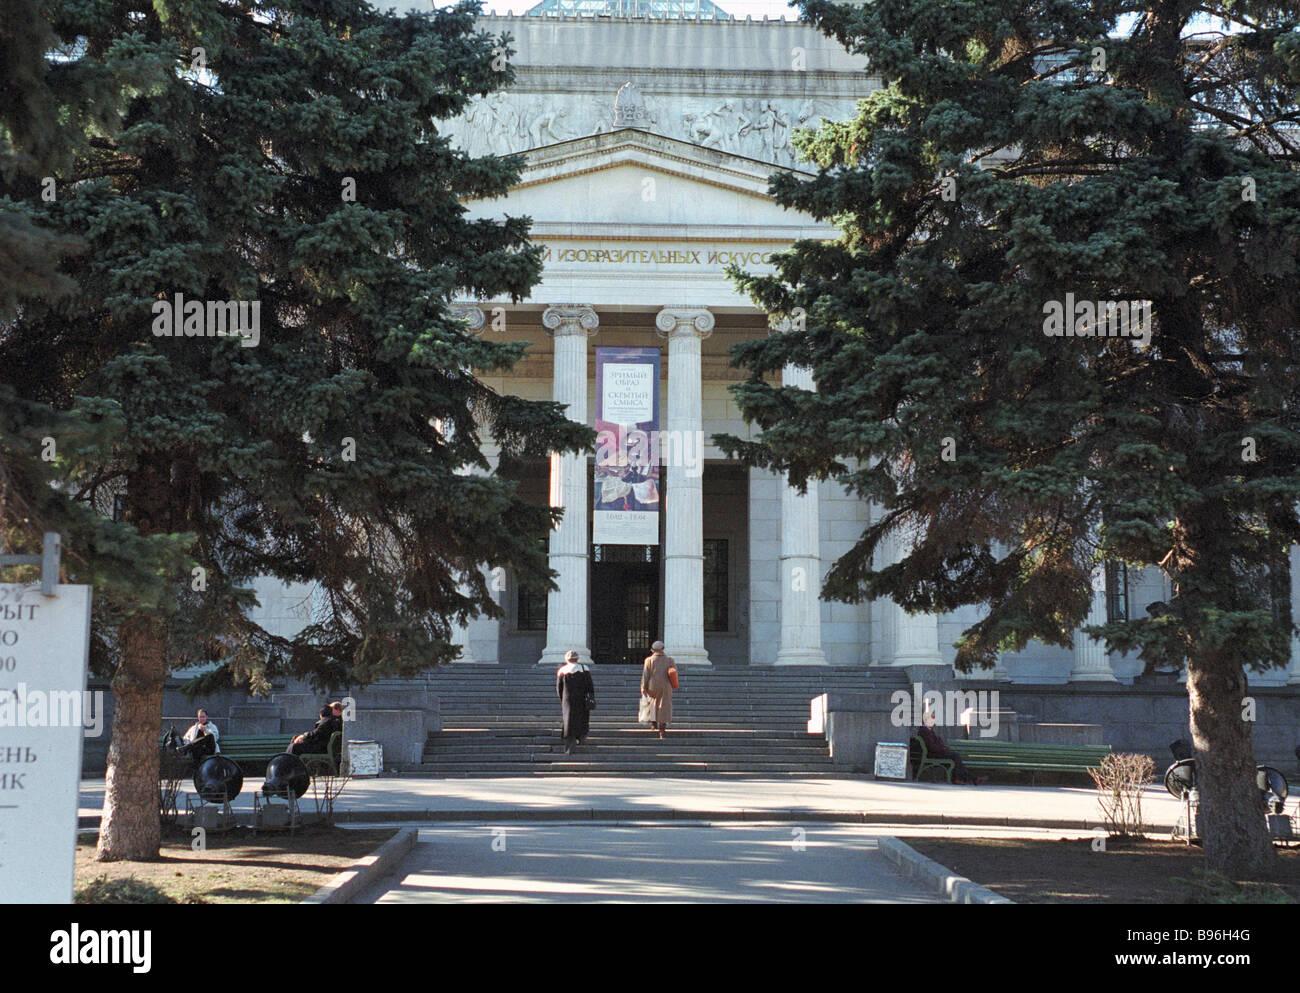 Alexander Pushkin tate Museum of Fine Arts - Stock Image